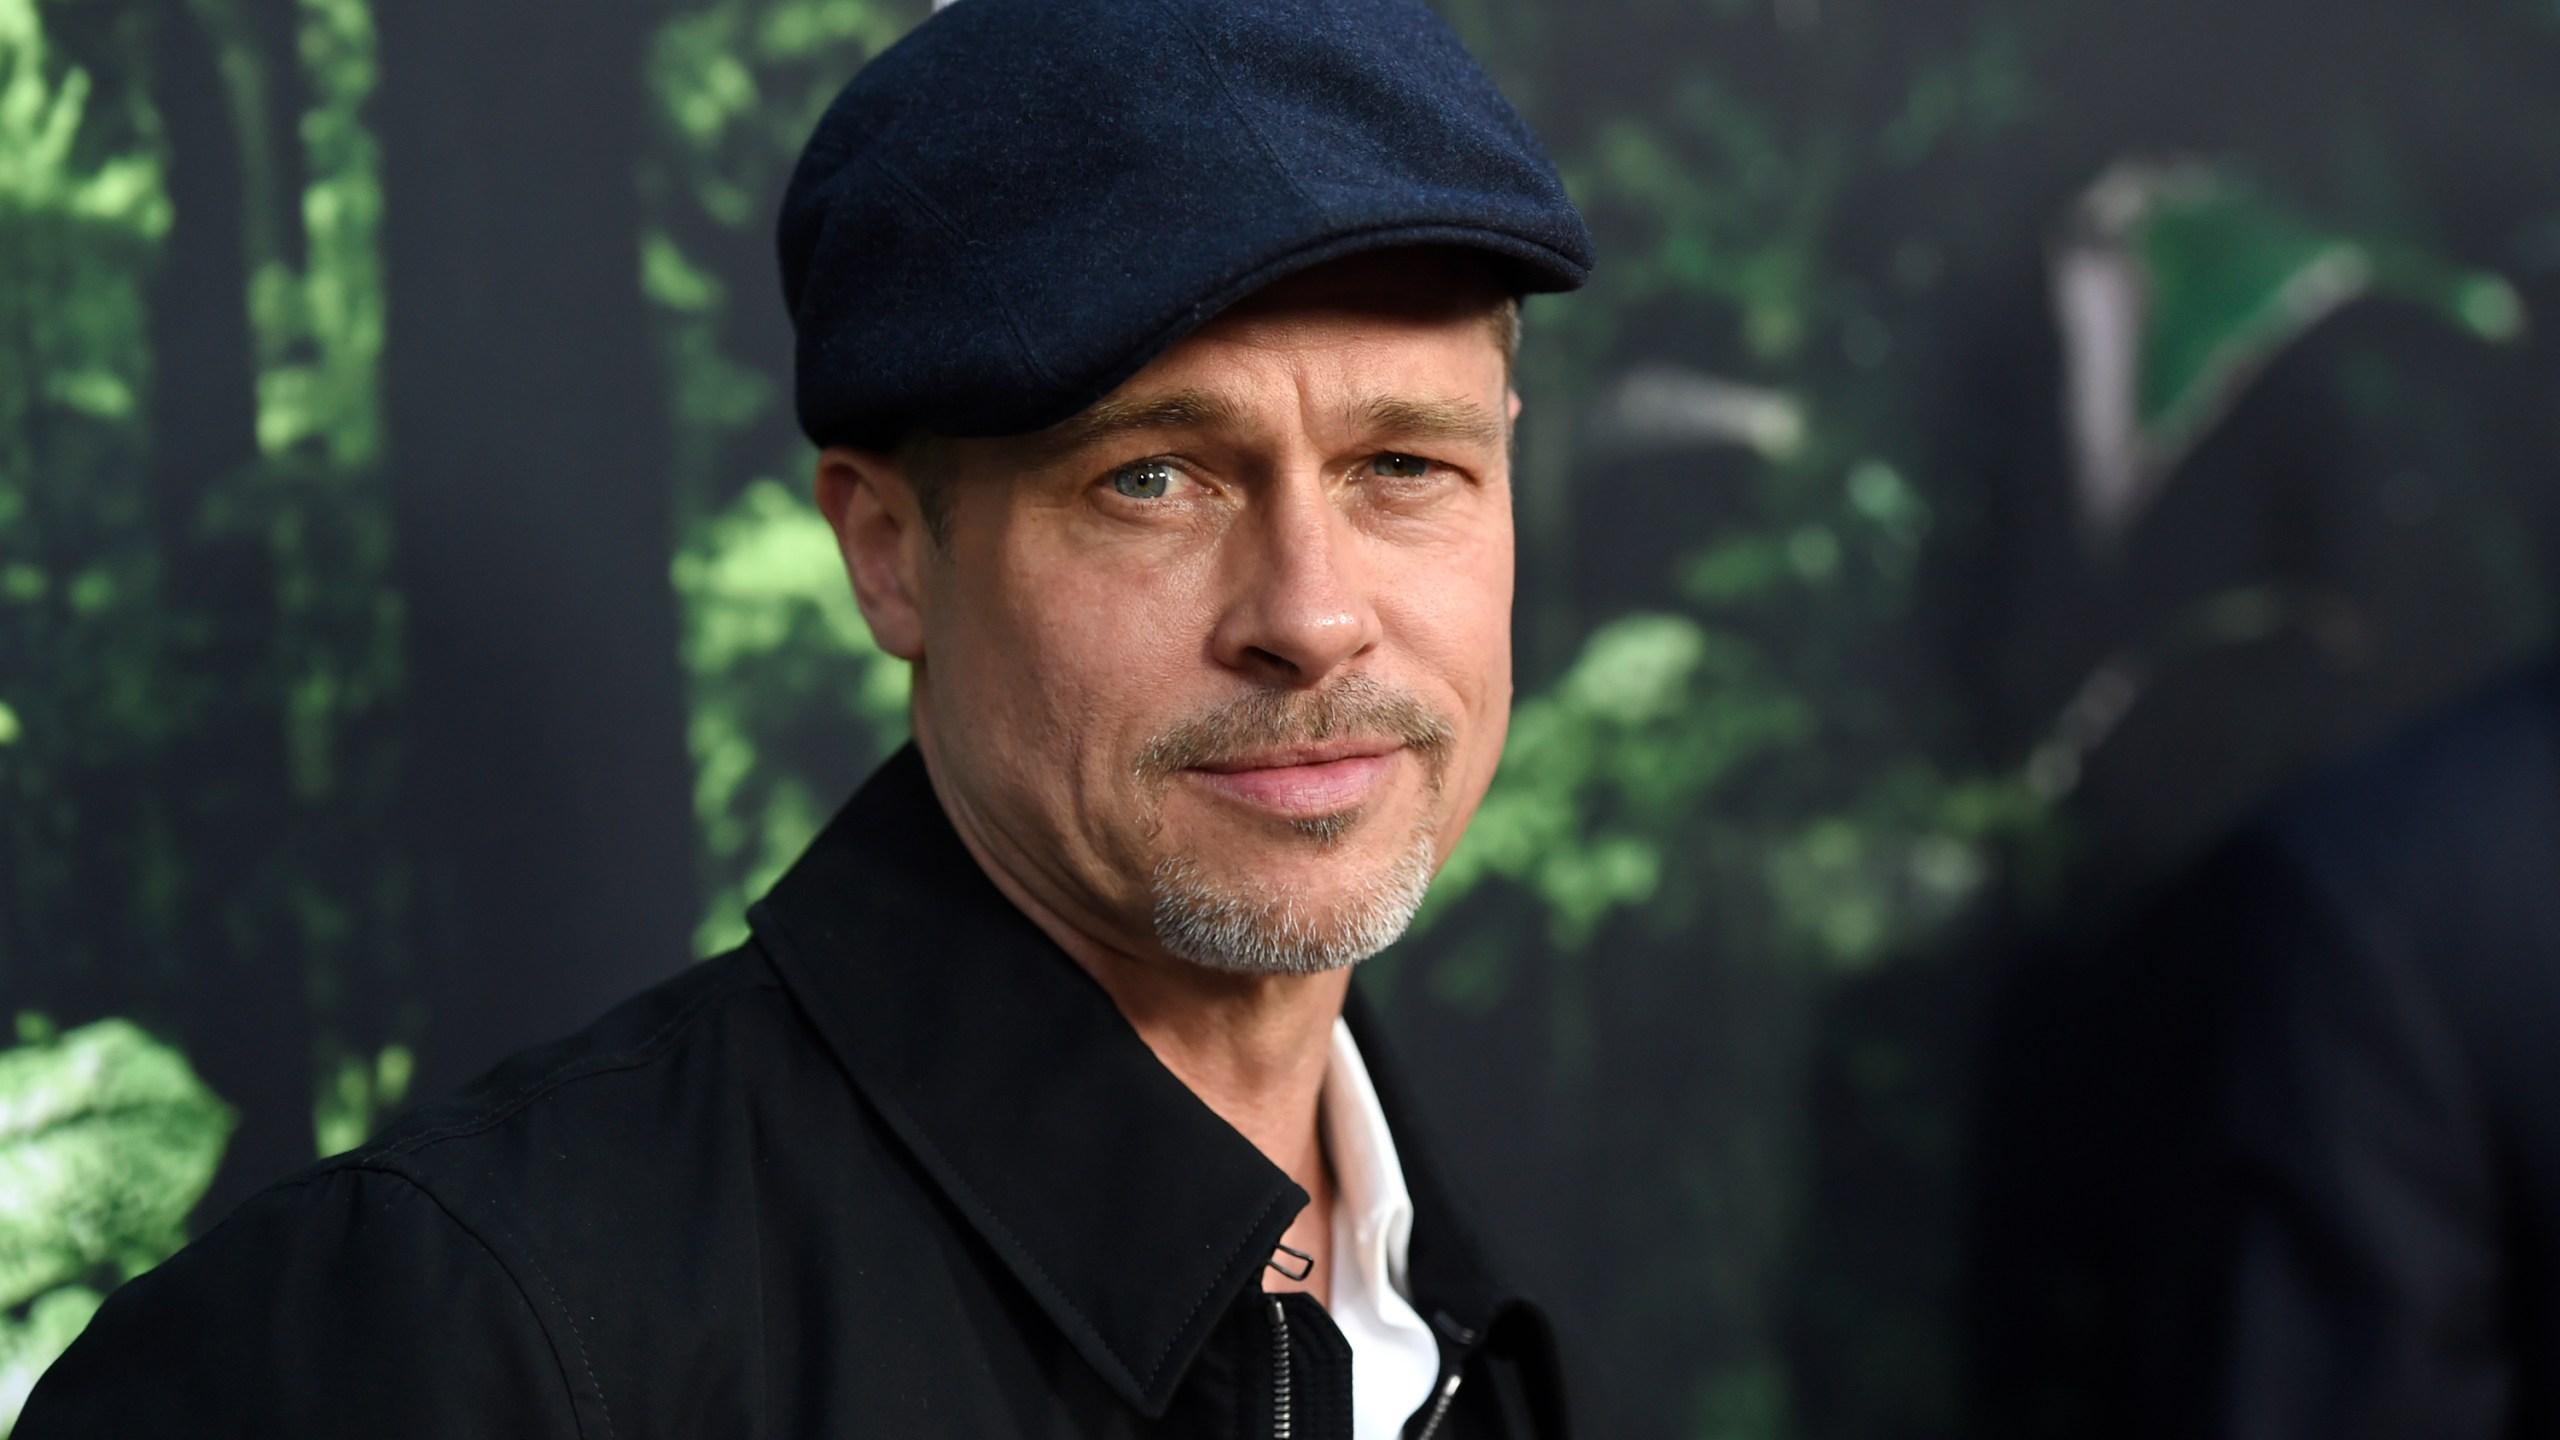 Brad Pitt Photo by Chris Pizzello, Invision, AP Photo_309478